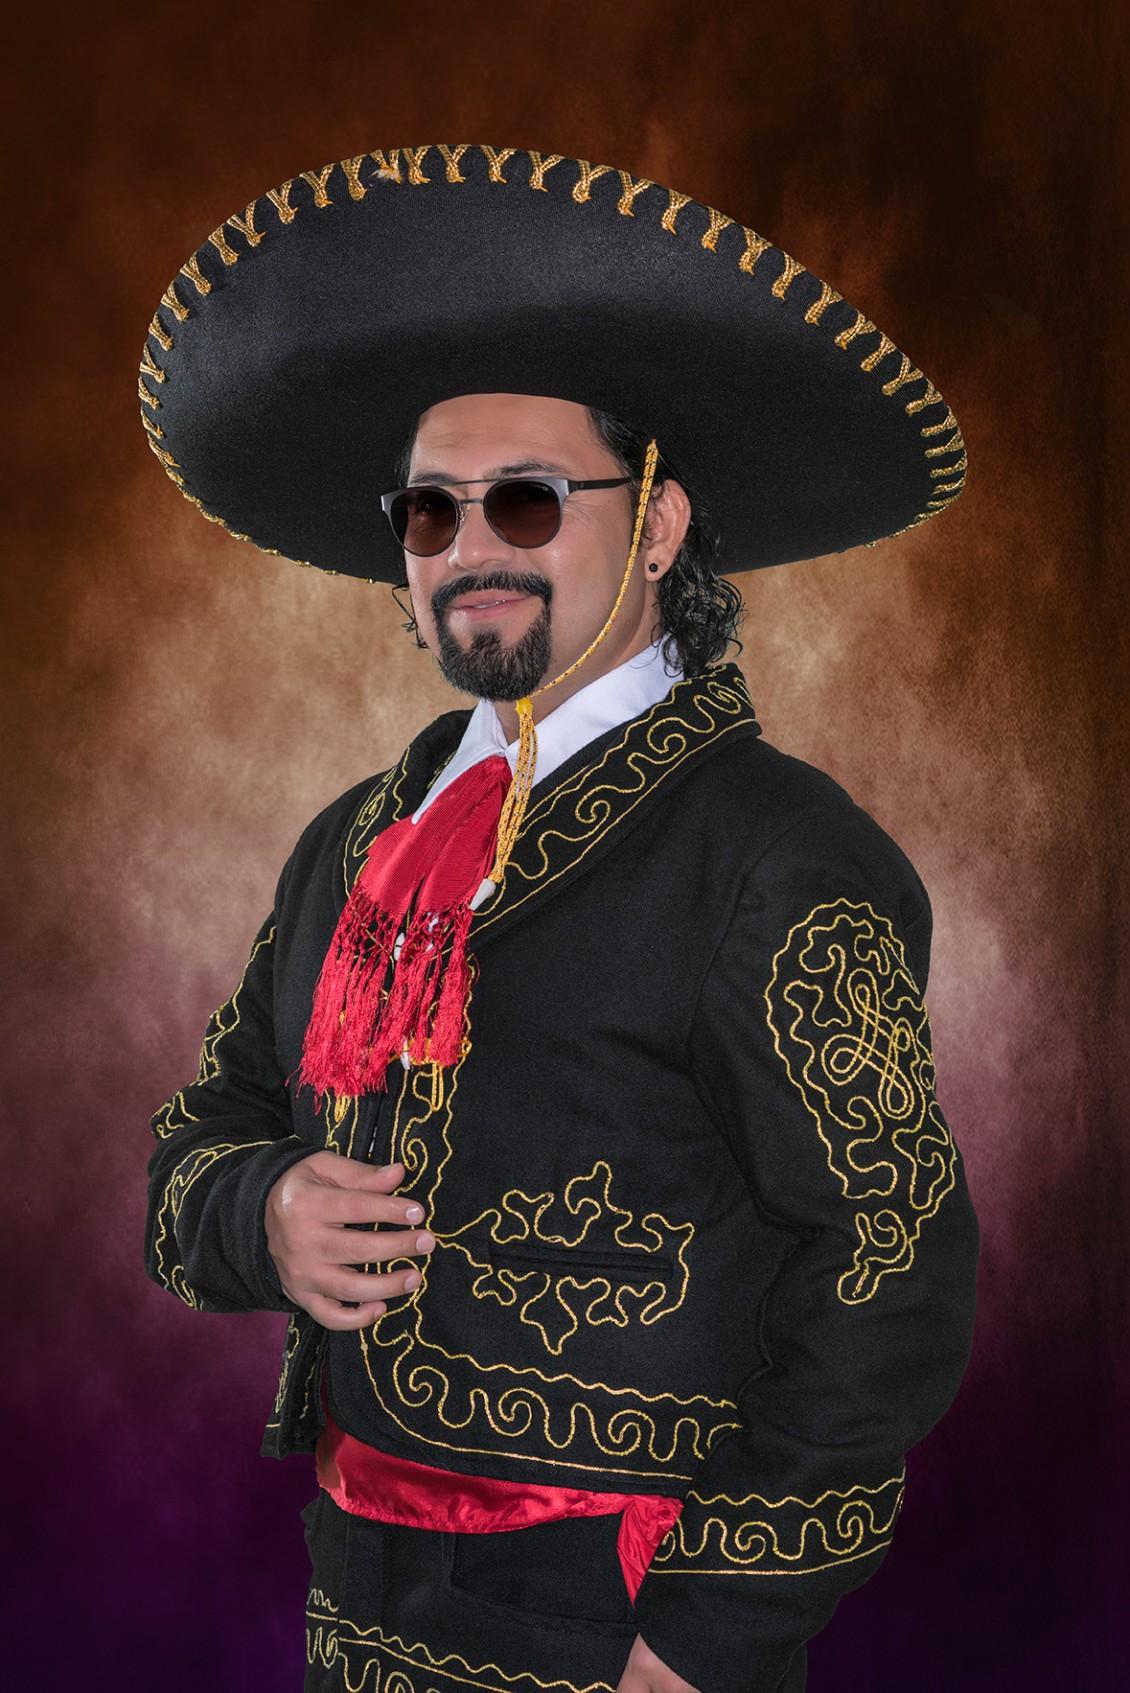 Mexican_Man_RGB_Screen